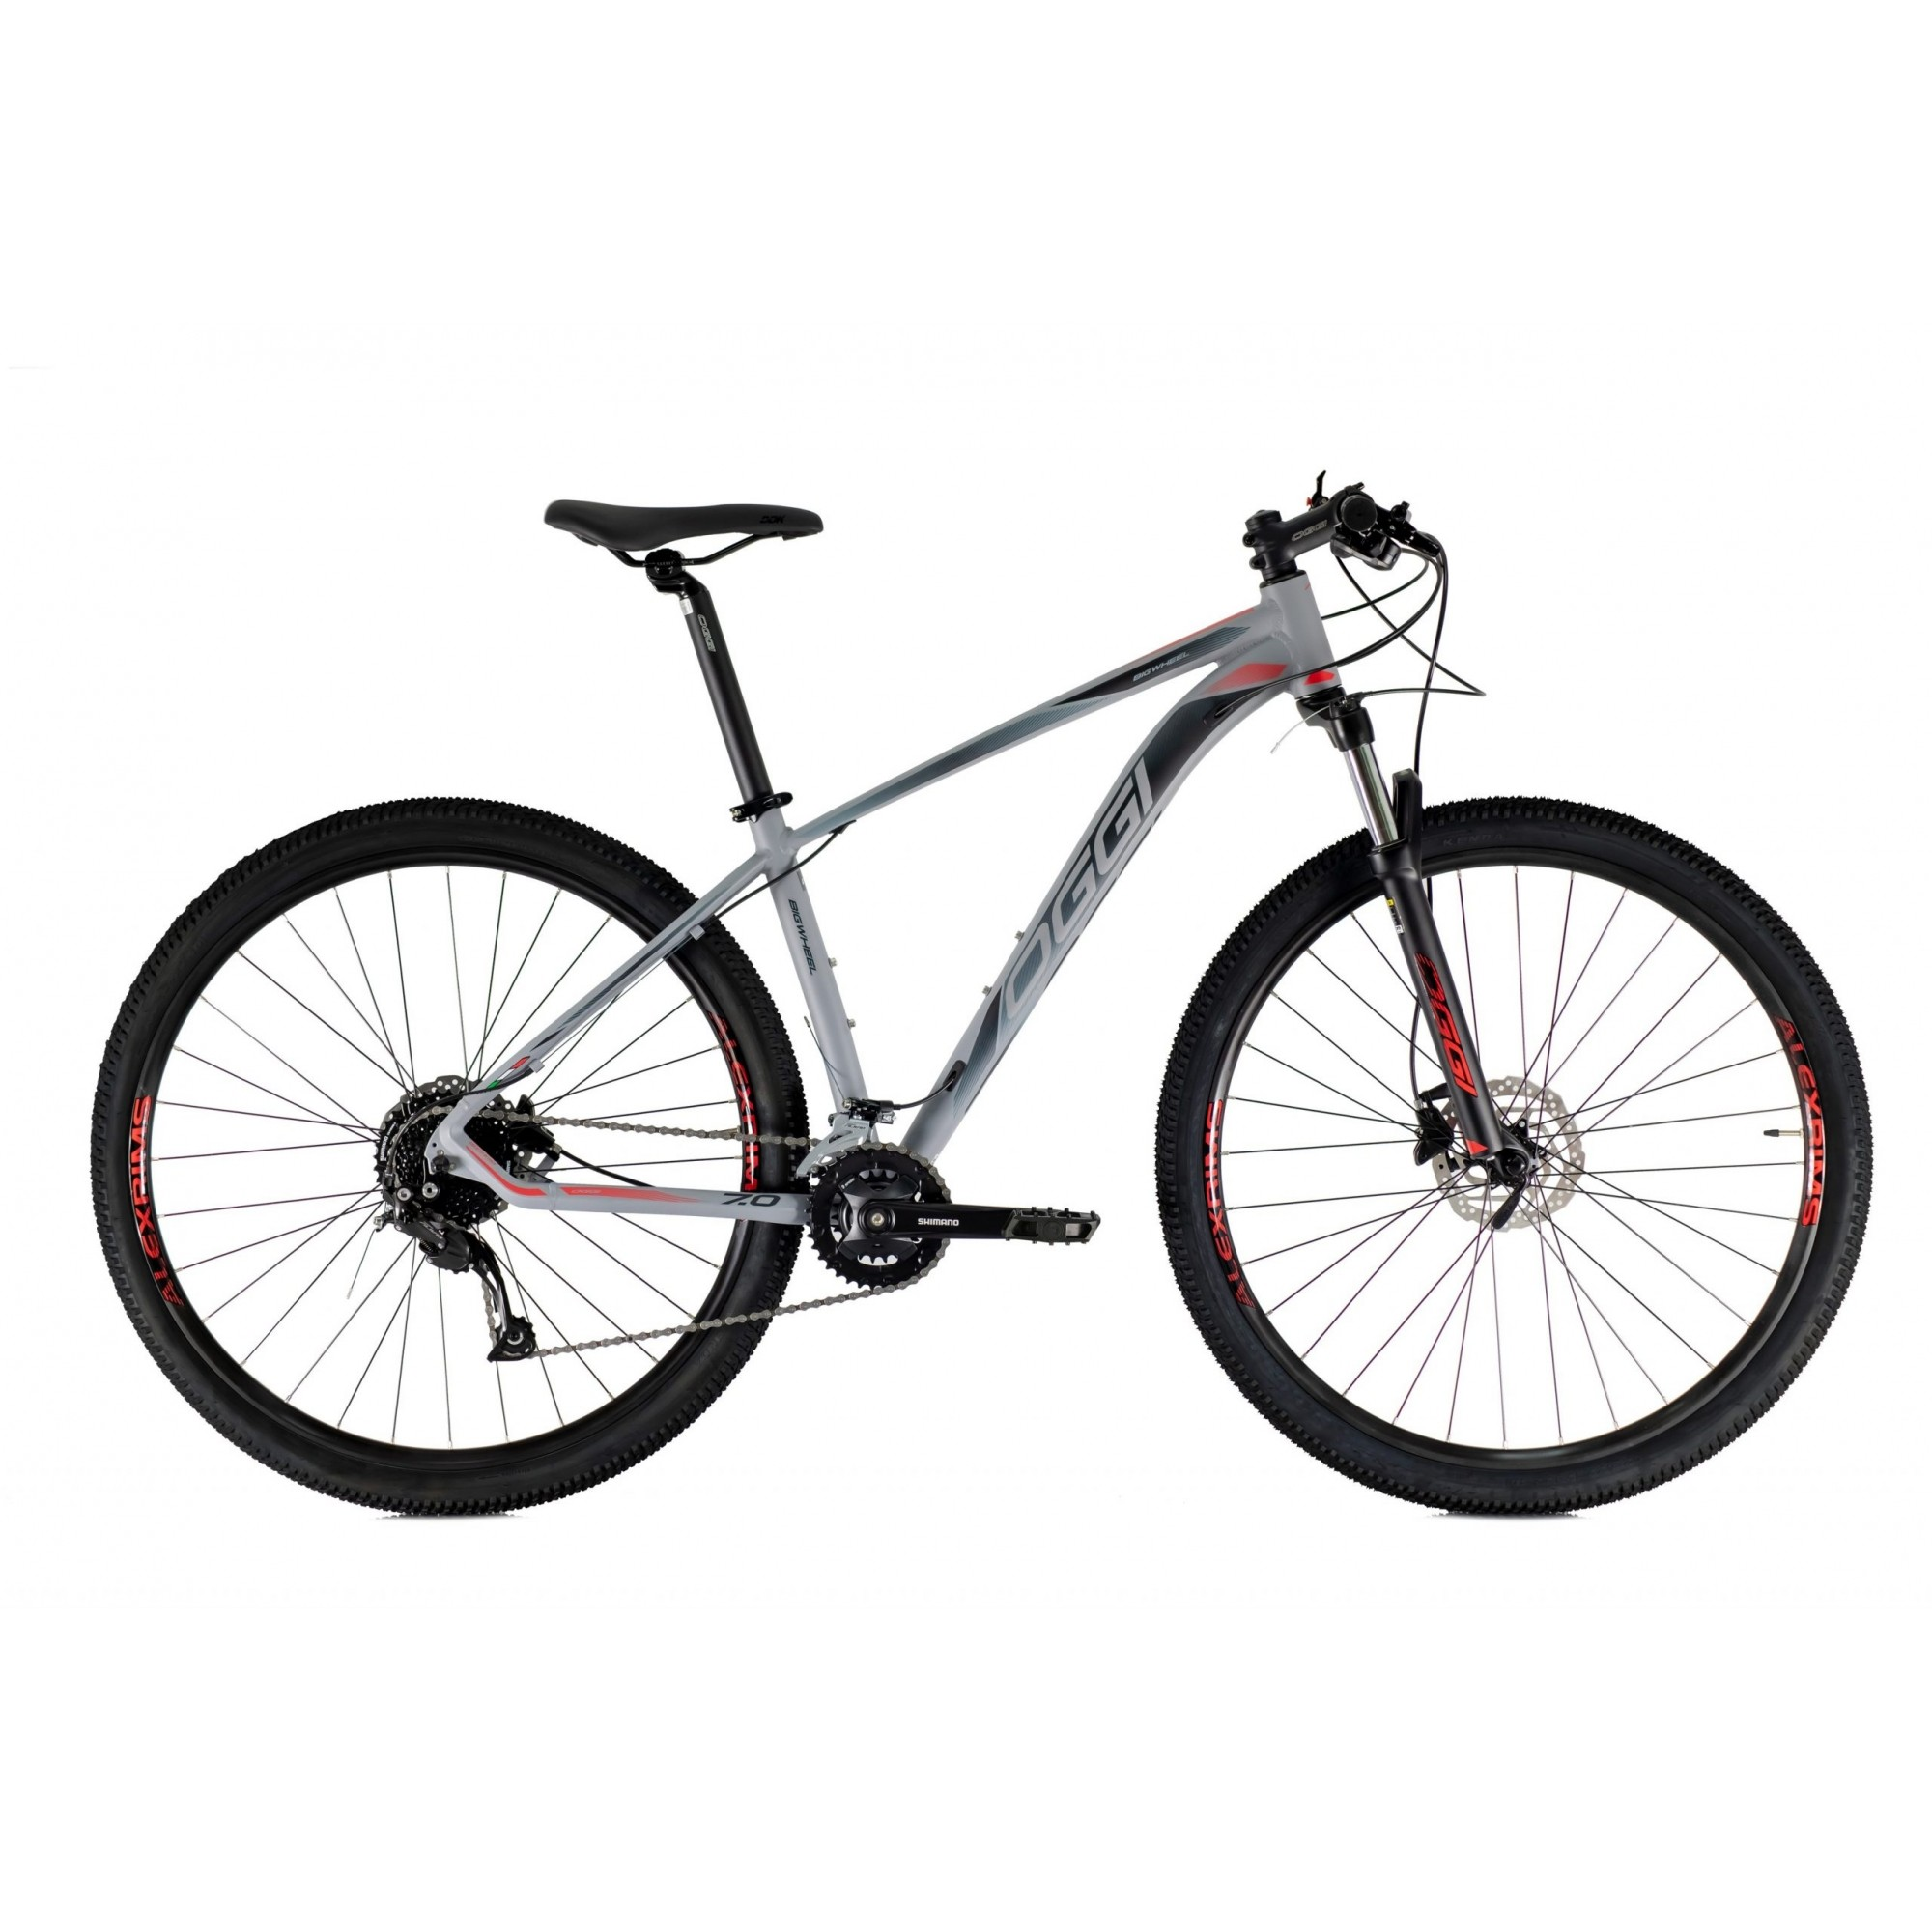 Bicicleta OGGI 7.0 aro 29 2021 - 18V Shimano Alivio - Freio Shimano Hidráulico - Cinza/Vermelho